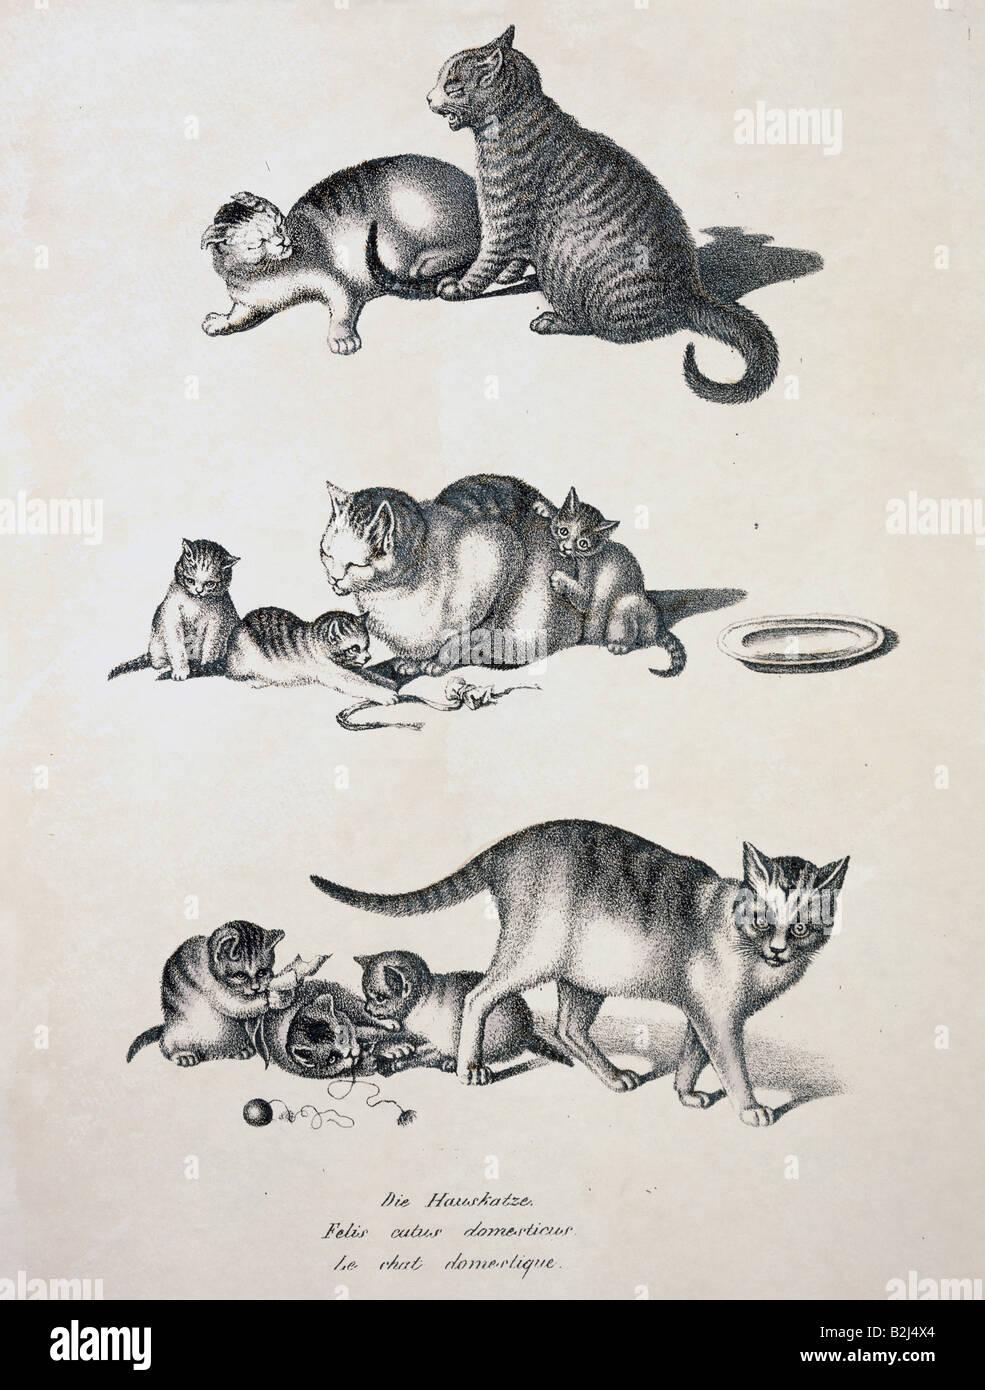 zoology / animal, mammal / mammalian, cats, domestic cat (Felis catus domesticus), chalk lithograph, coloured, by - Stock Image